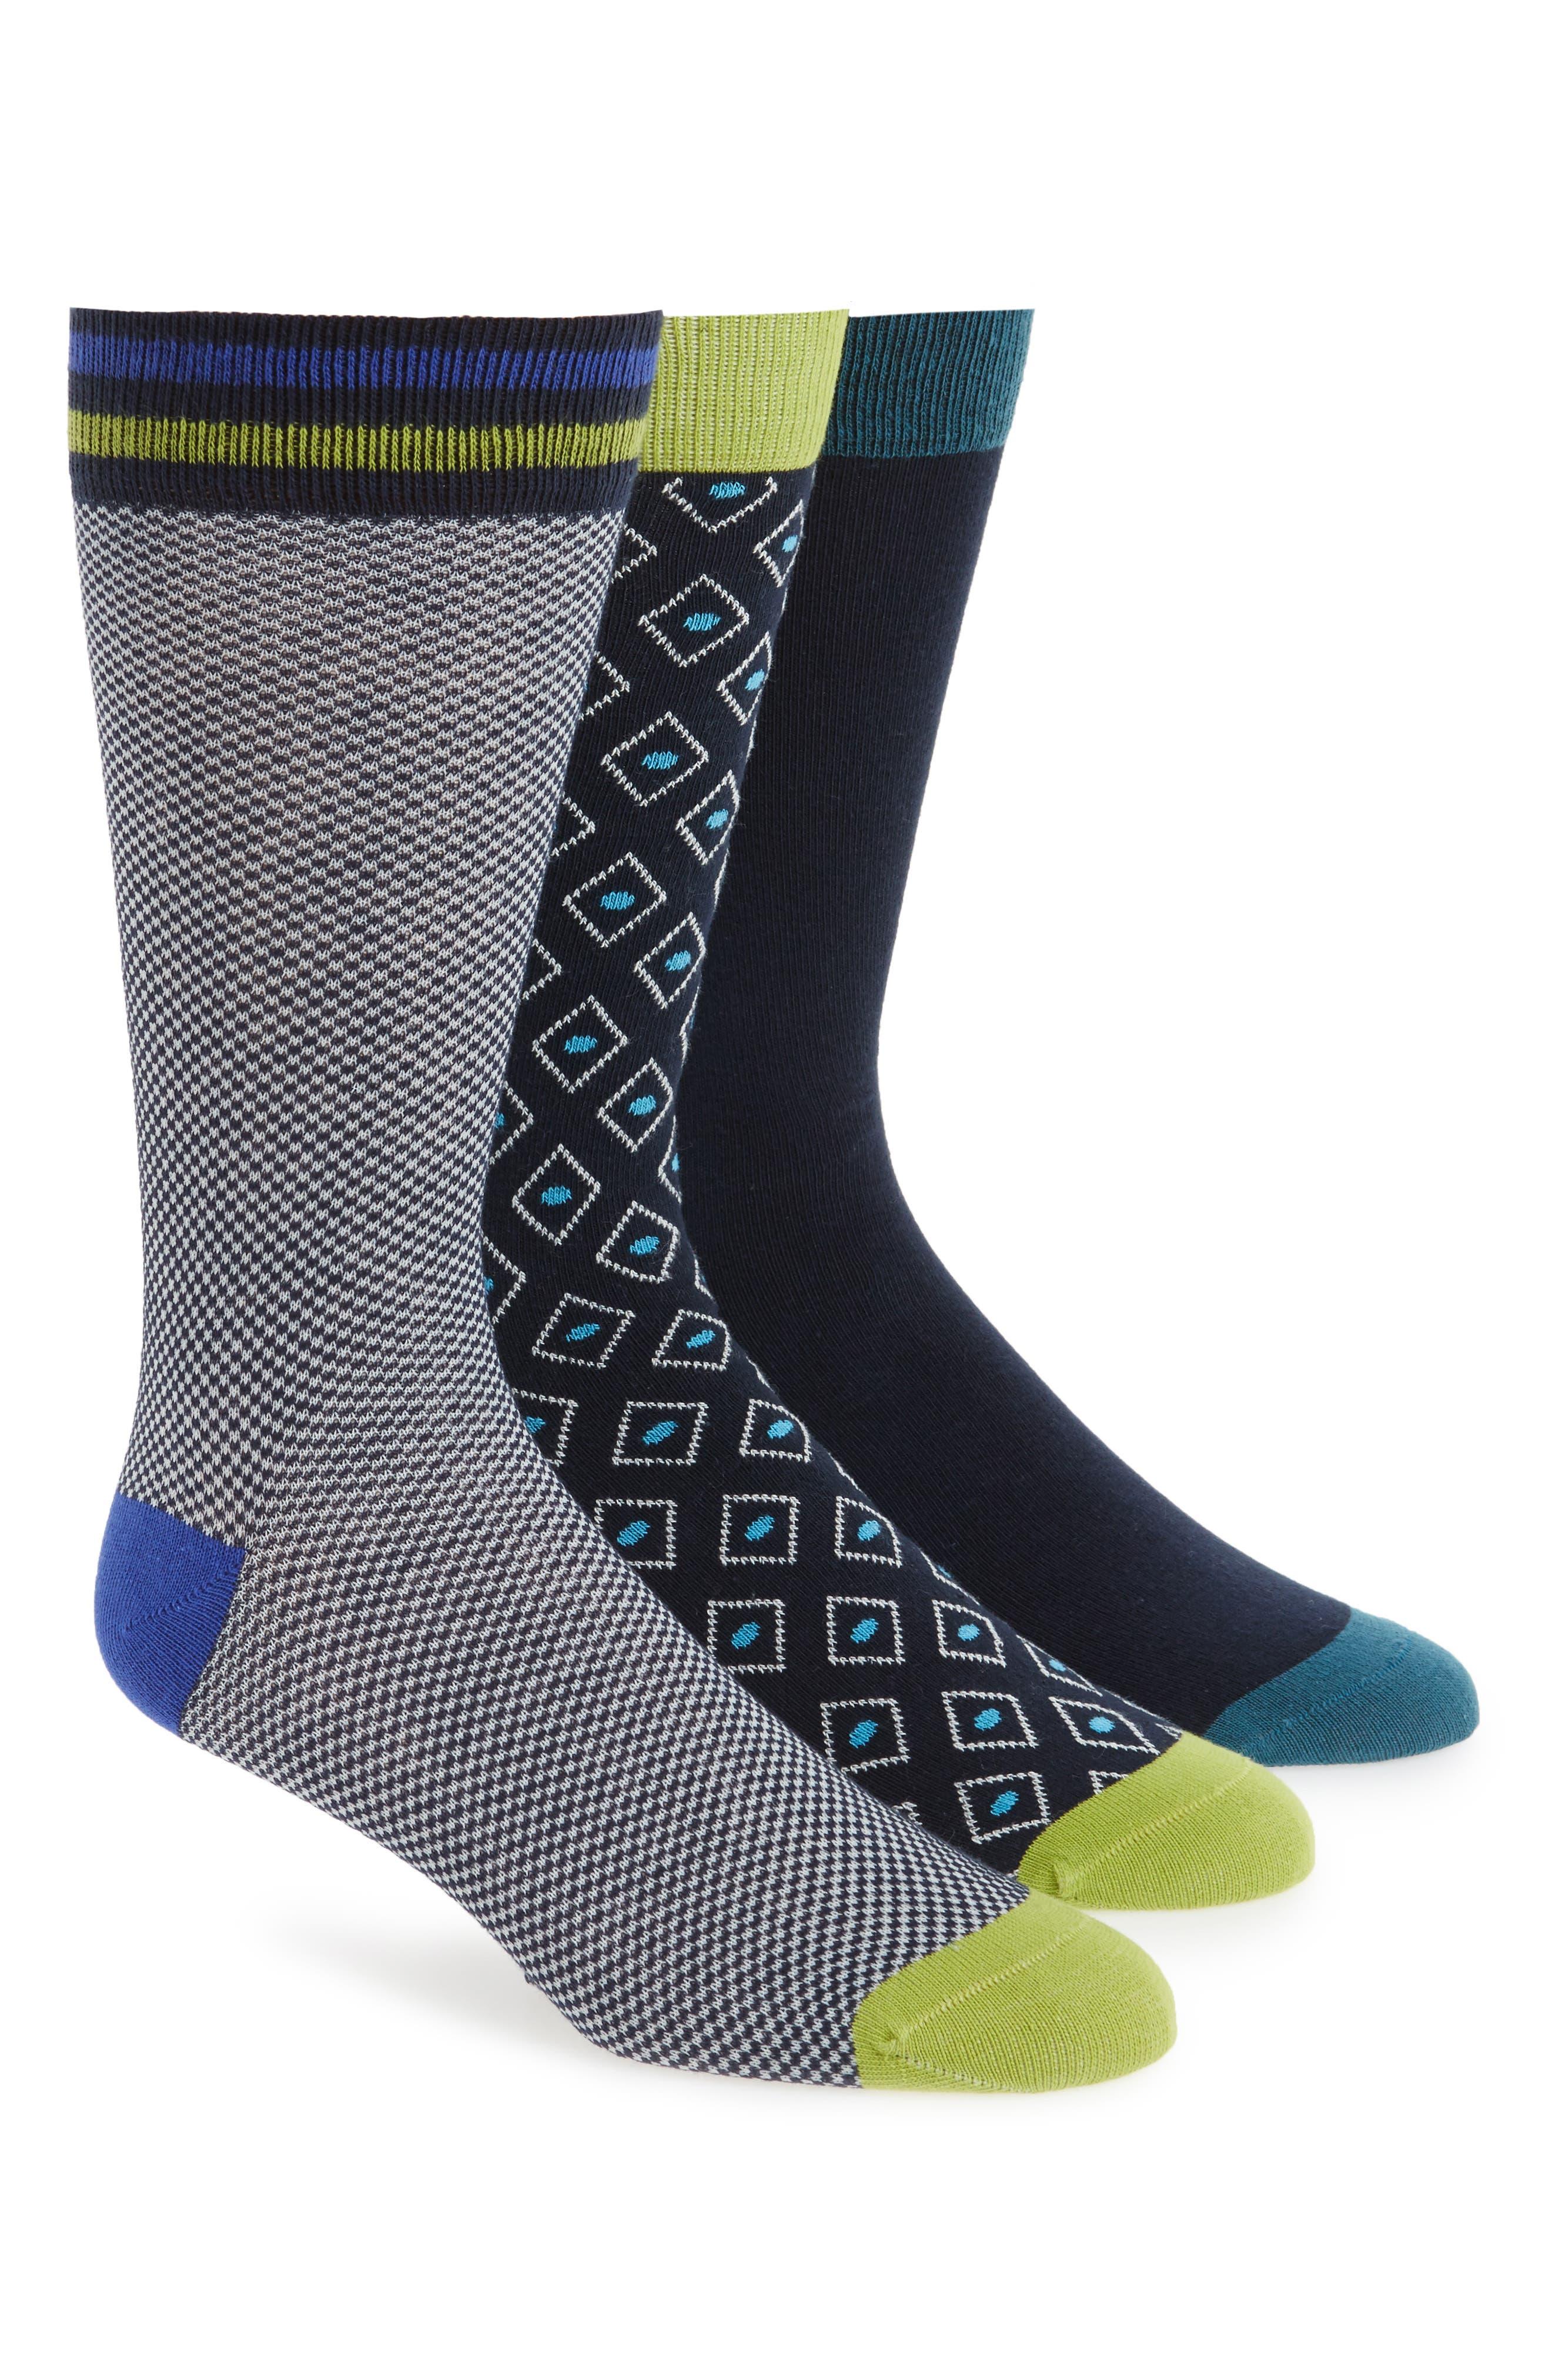 3-Pack Socks,                         Main,                         color, 460